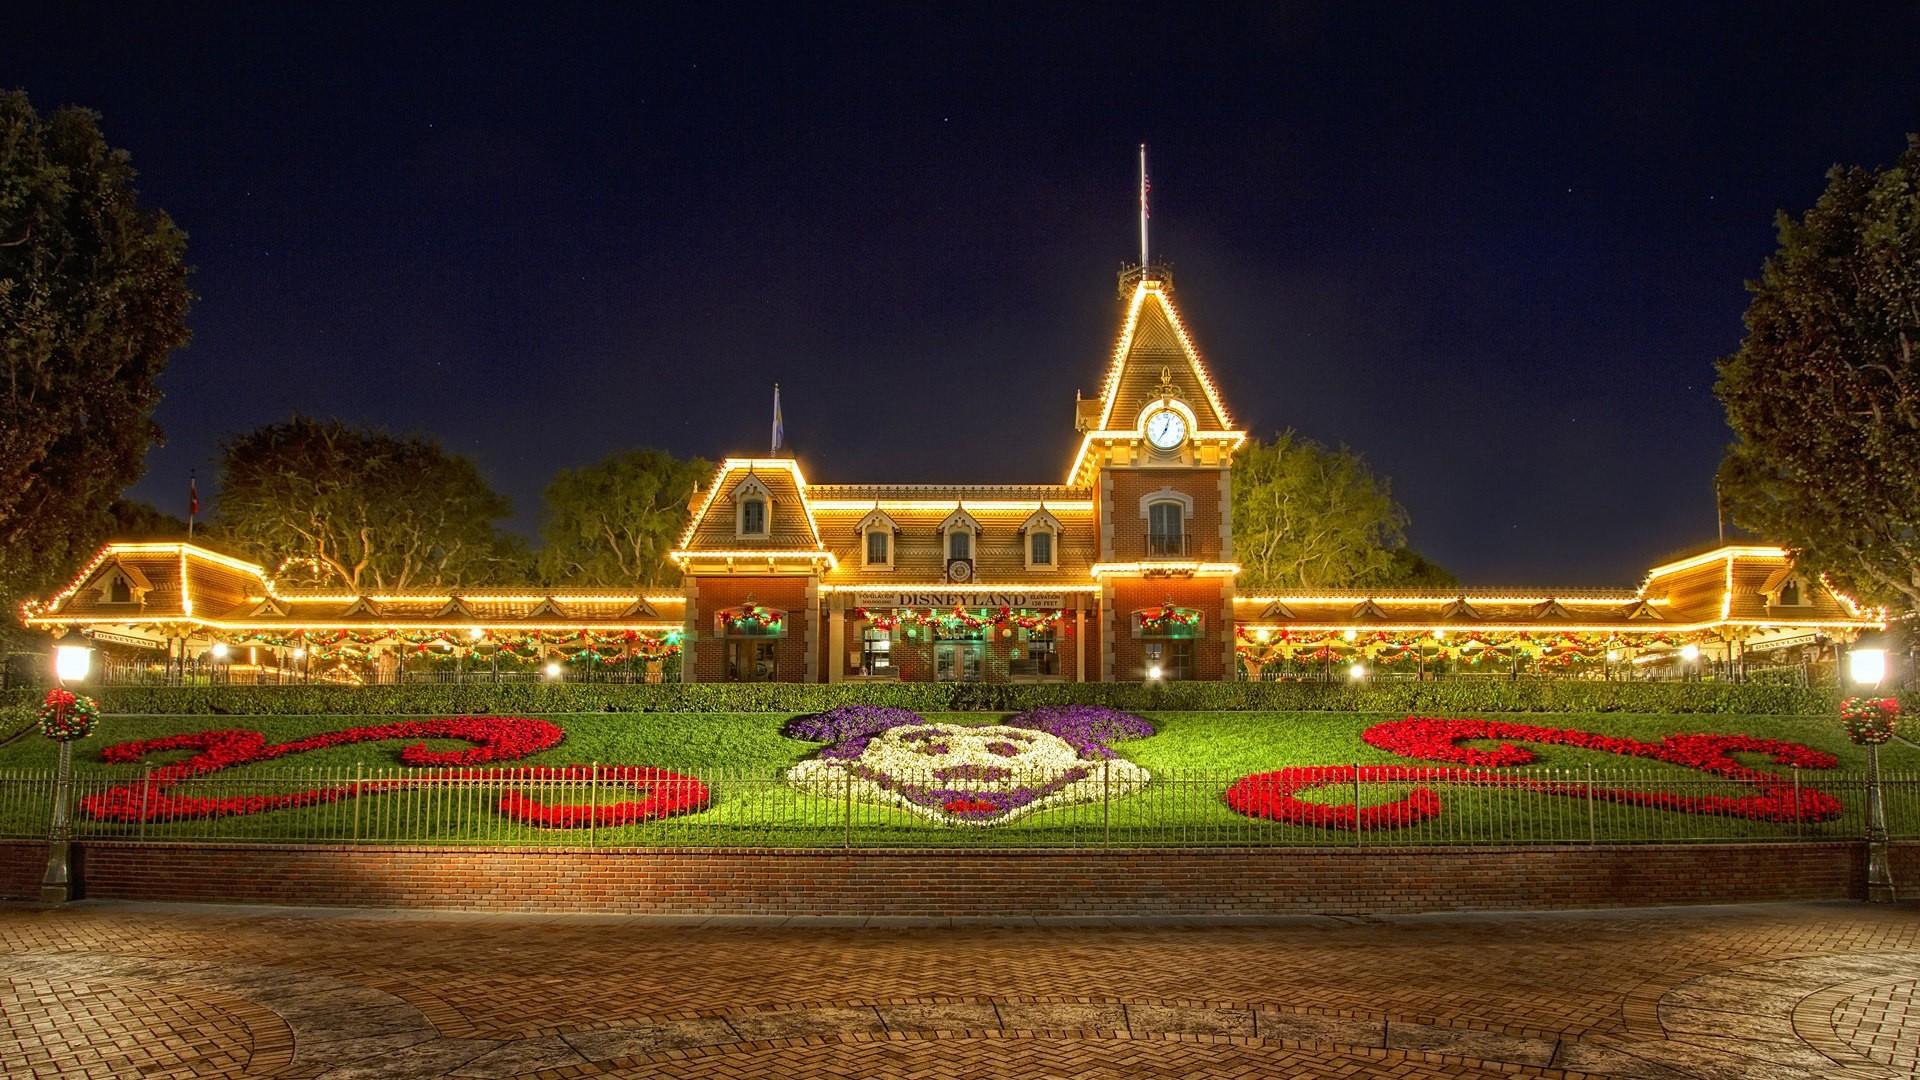 Christmas at Disneyland desktop PC and Mac wallpaper